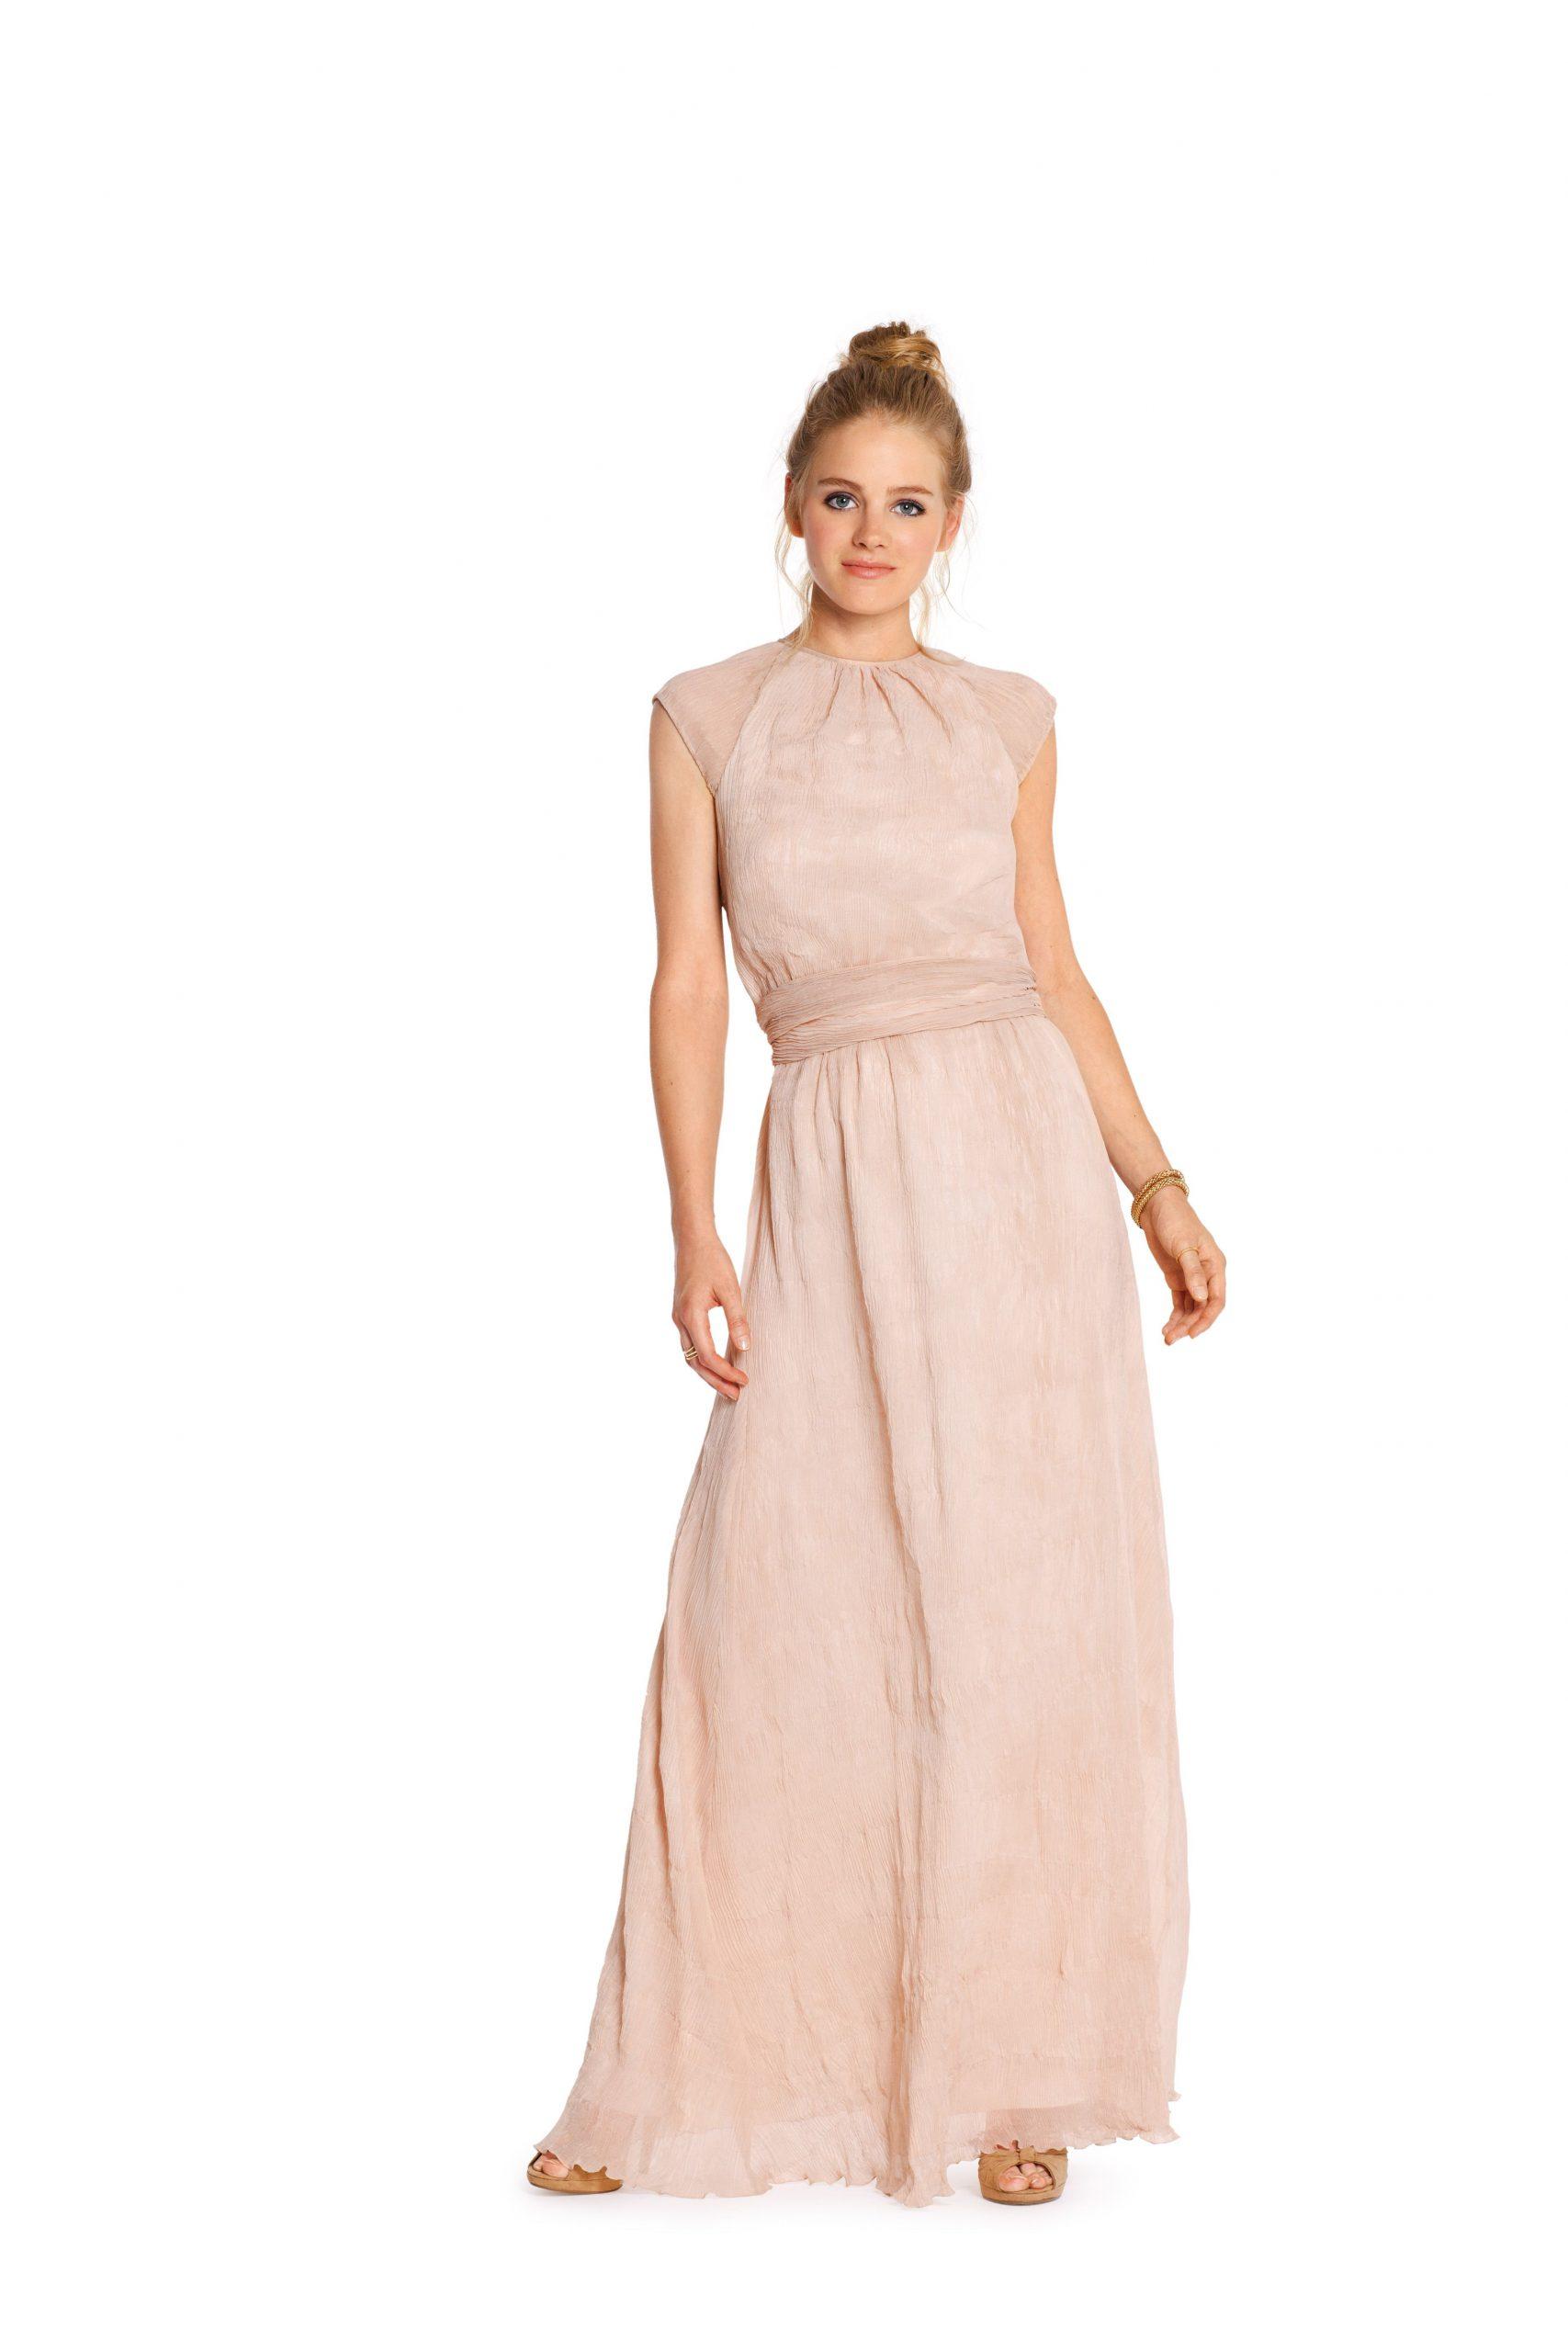 Zu Nähen Evening Dress Burda 7260 | Schnittmuster Abendkleid